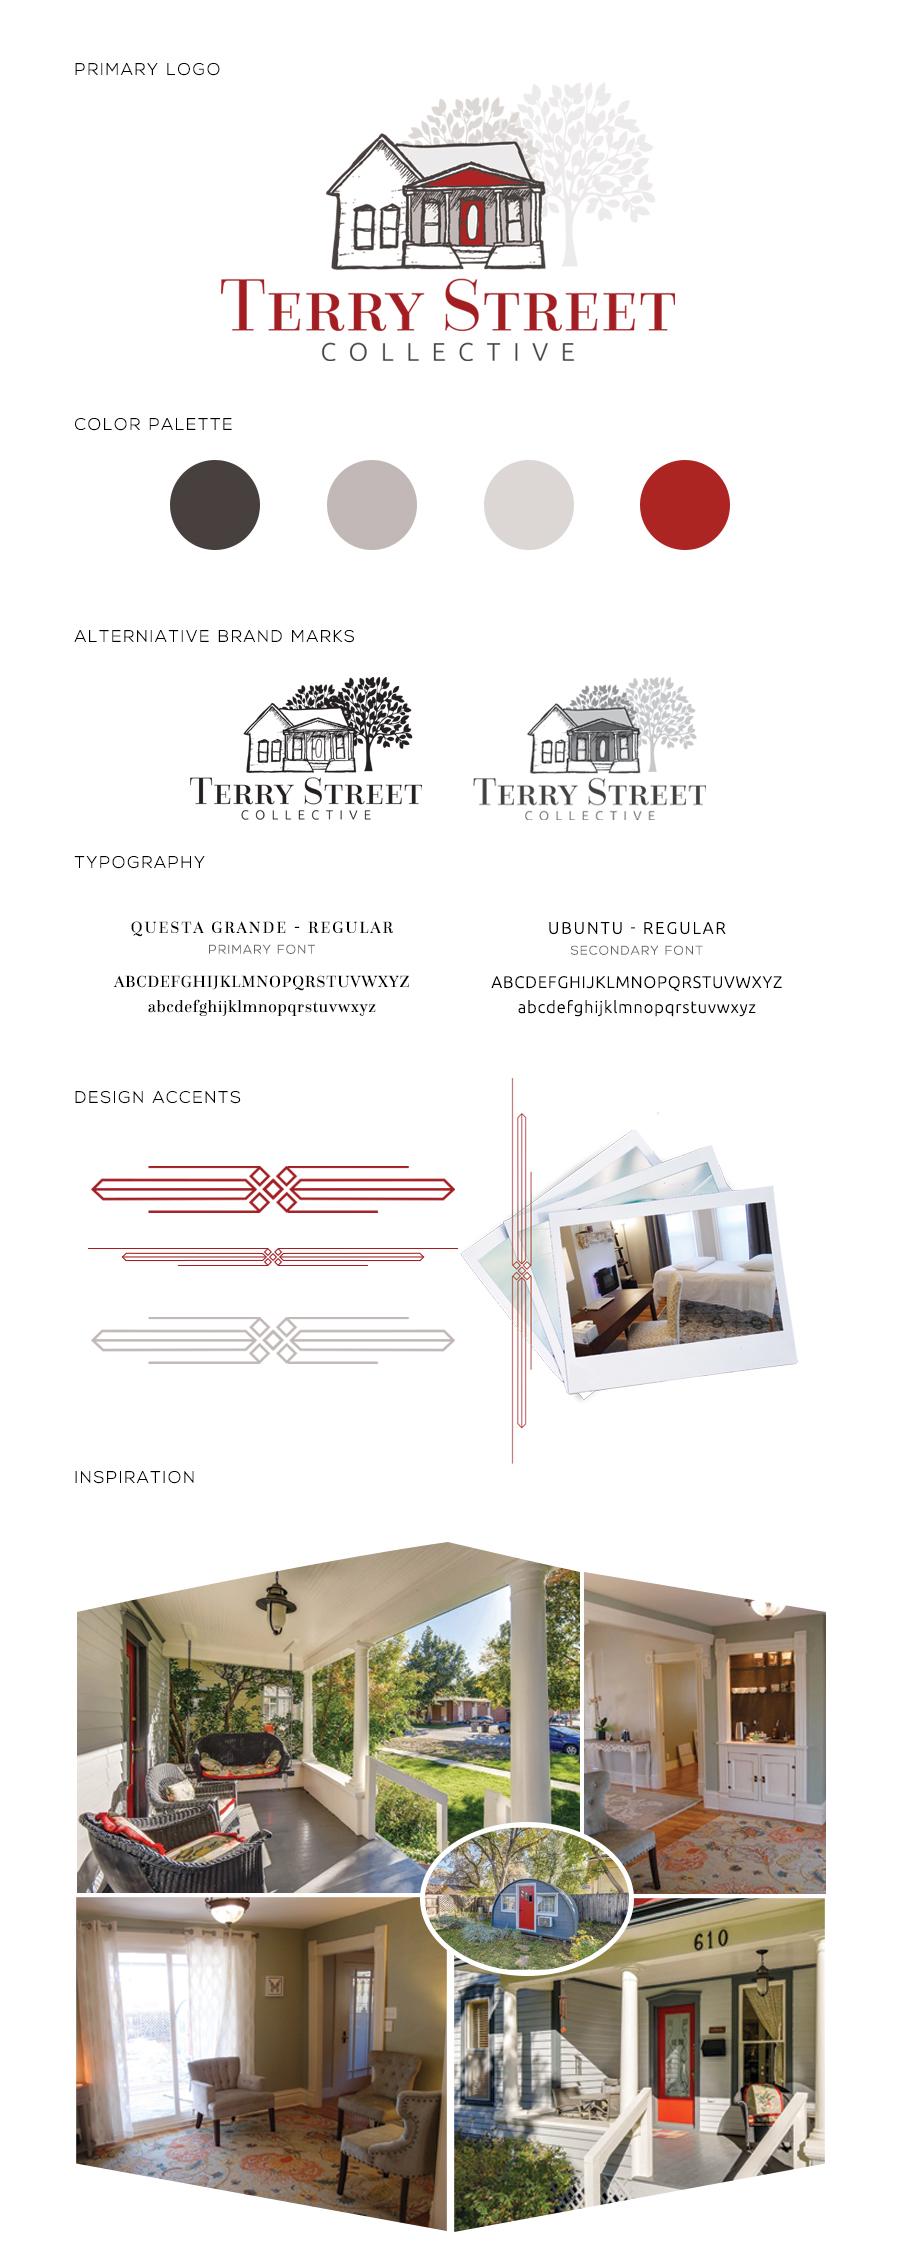 terrystreet_branding_board.jpg